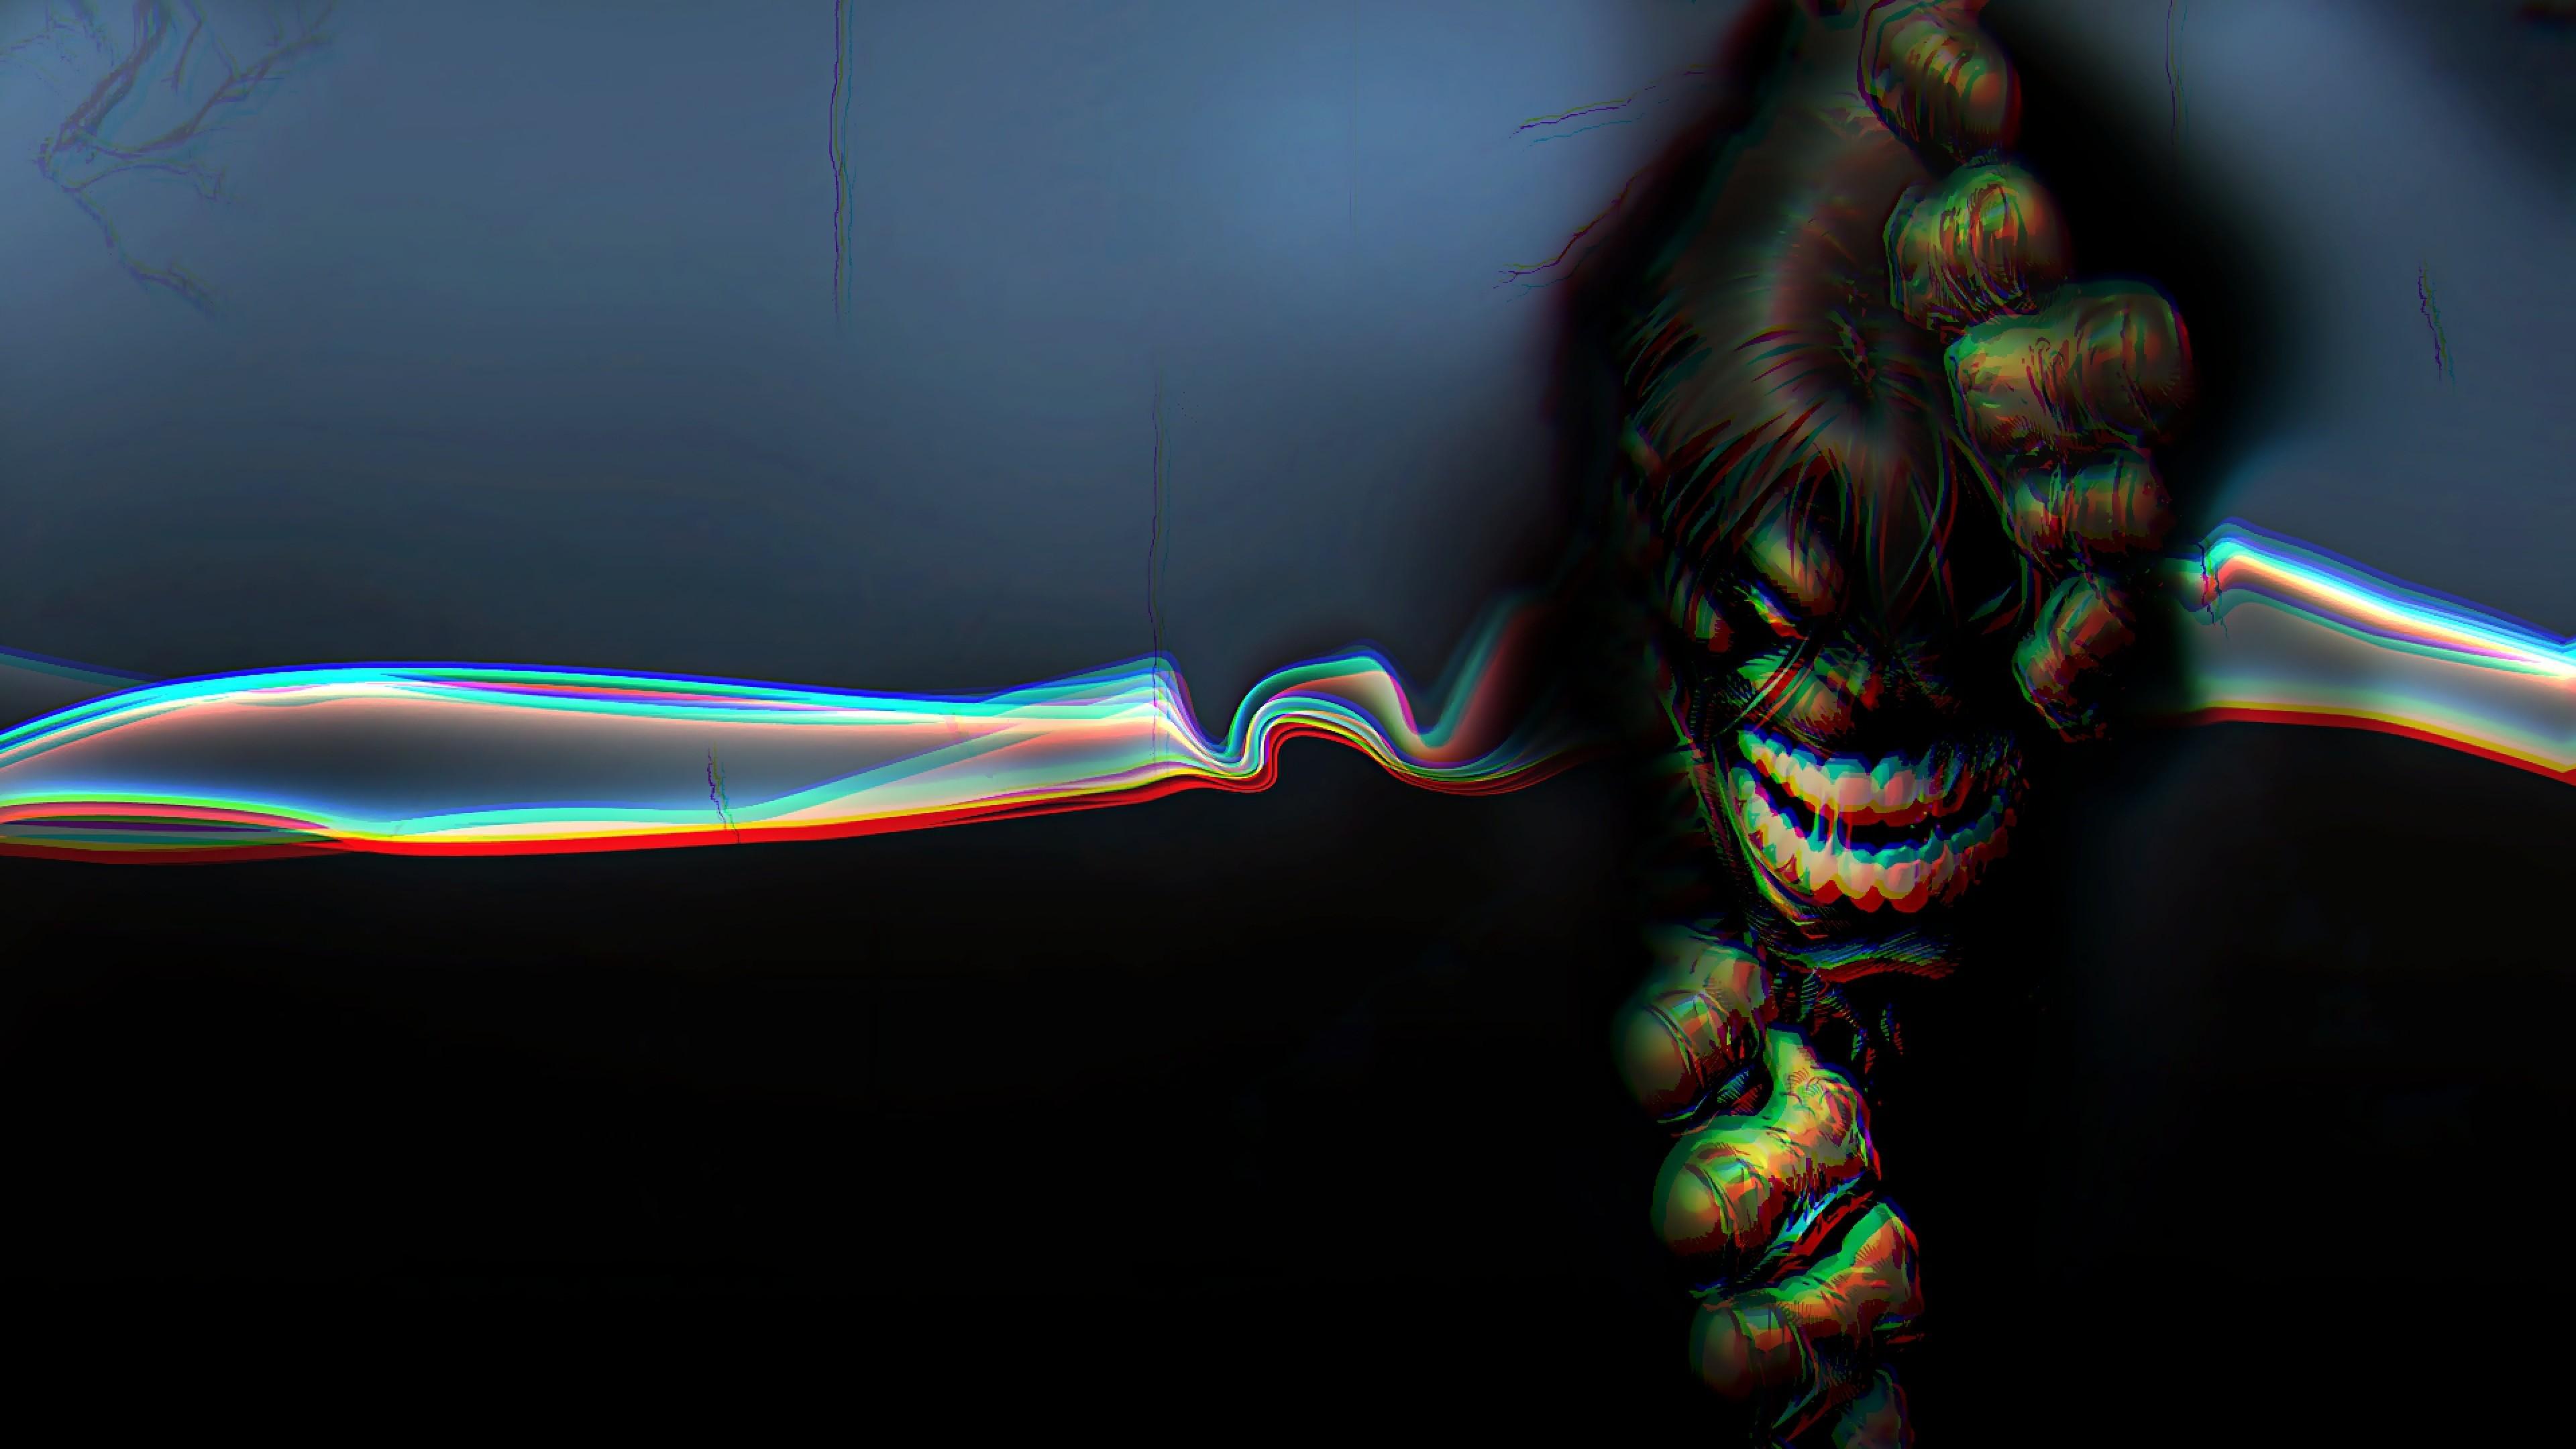 … Background 4K Ultra HD. Wallpaper hulk, 3d, anaglyph,  graphics, bright